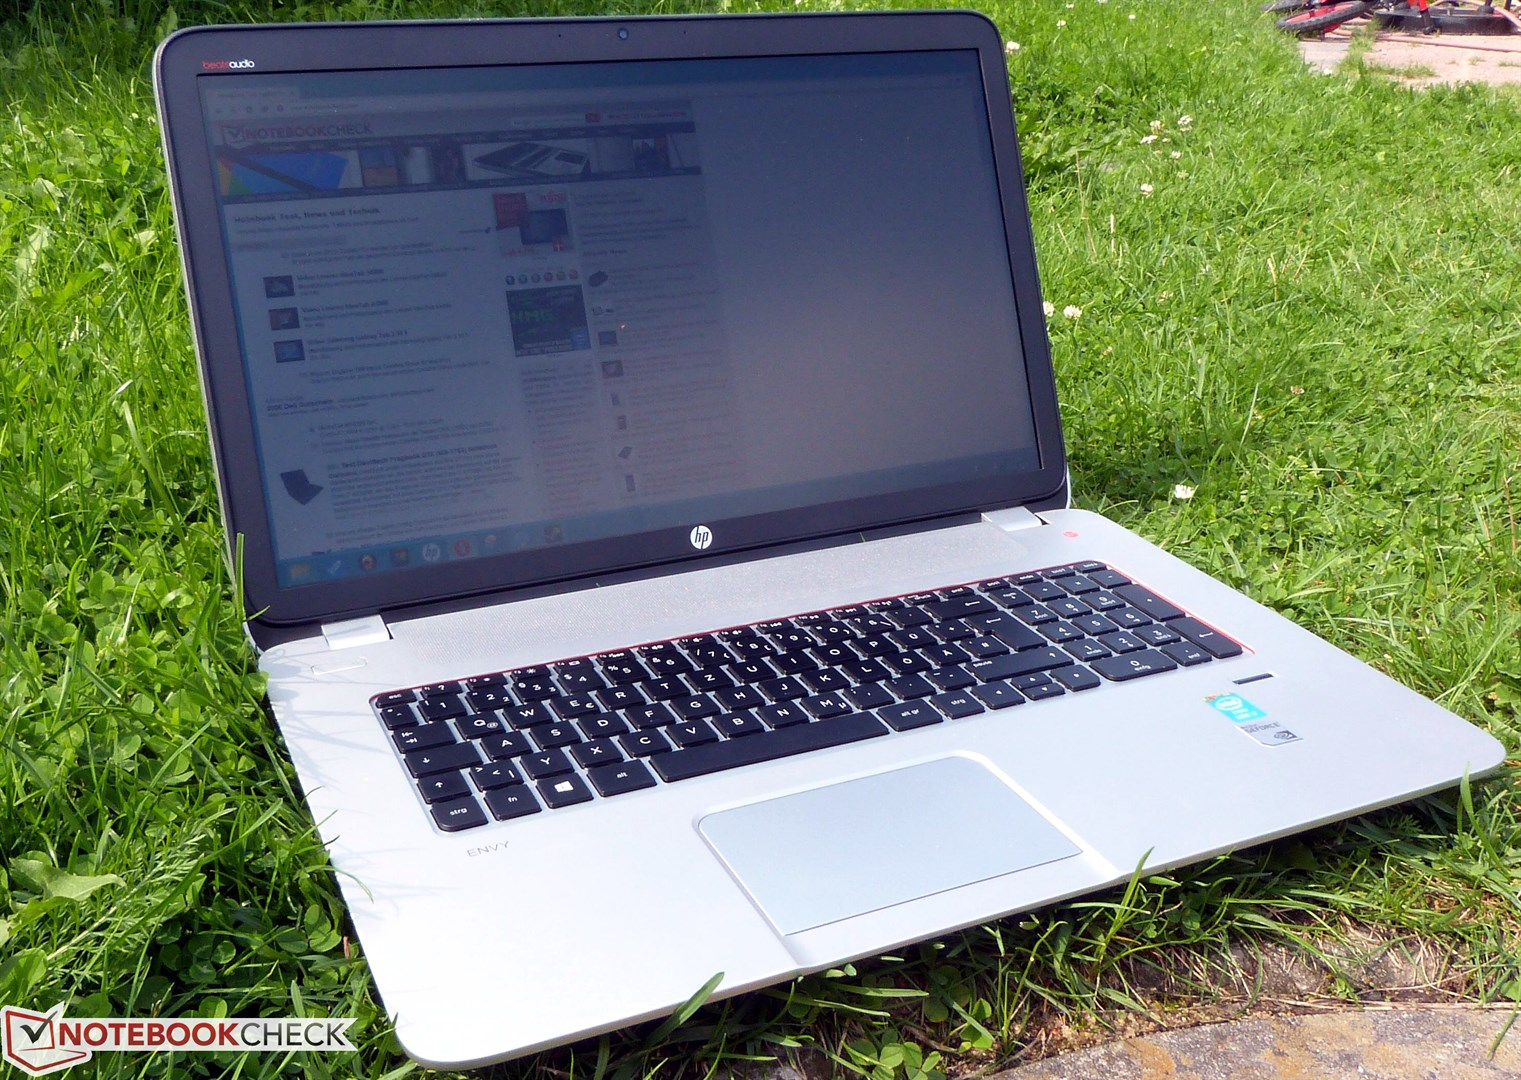 HP Envy 17-2002xx Notebook Windows 7